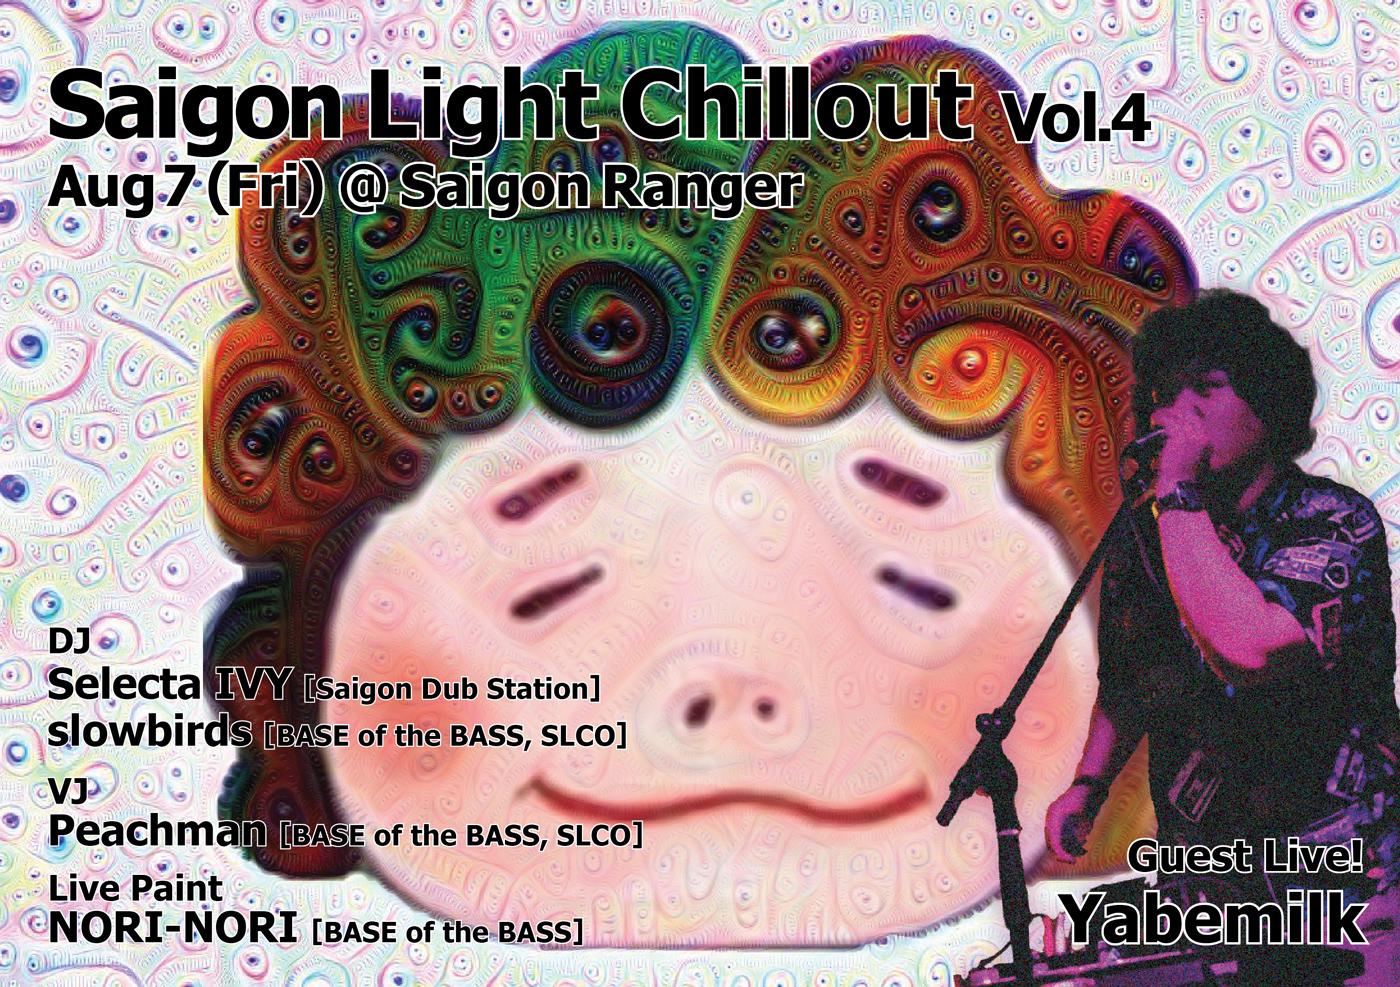 Saigon Light Chill-Out vol.4